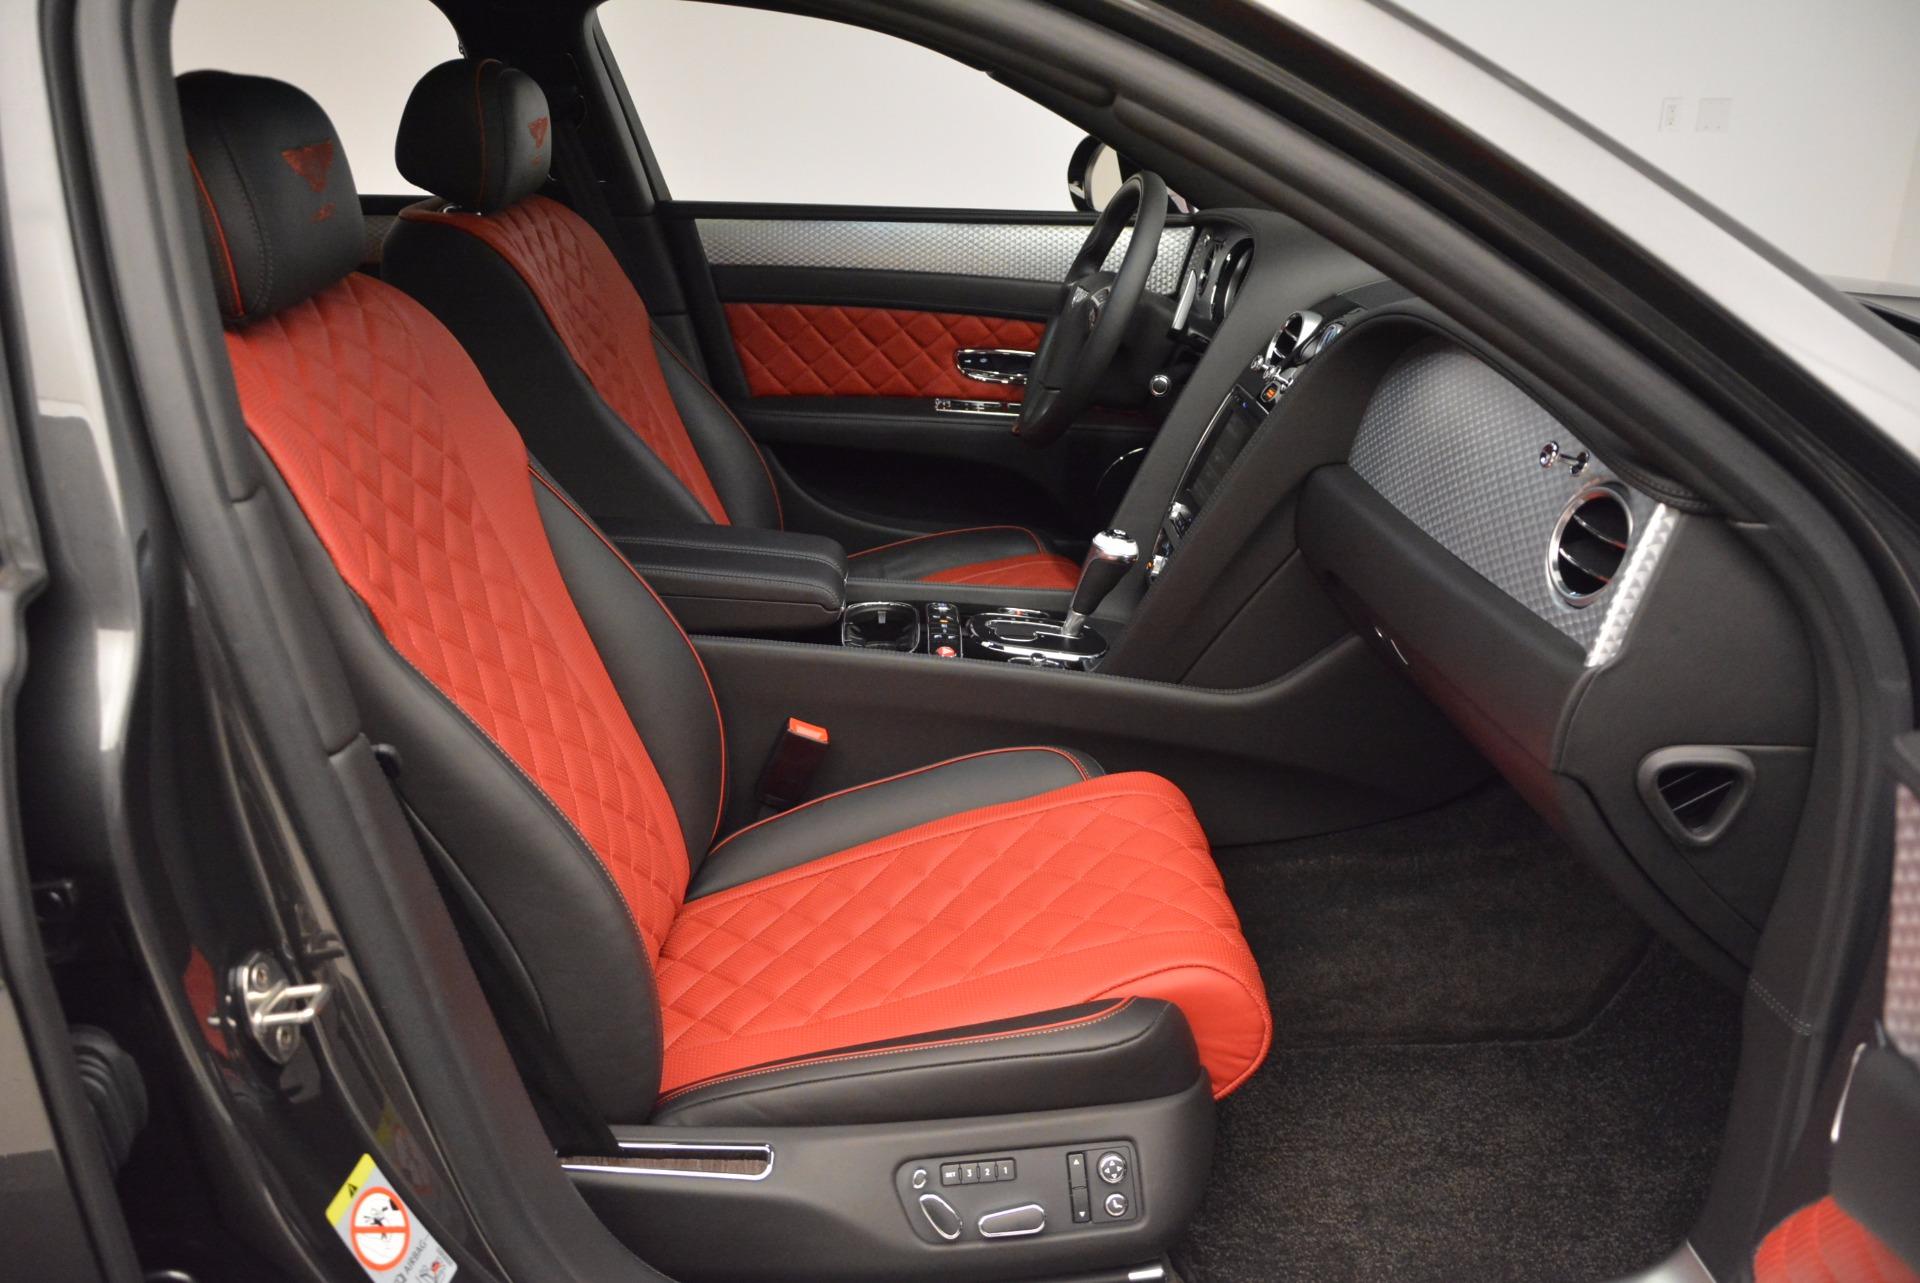 Used 2017 Bentley Flying Spur V8 S For Sale In Westport, CT 875_p45